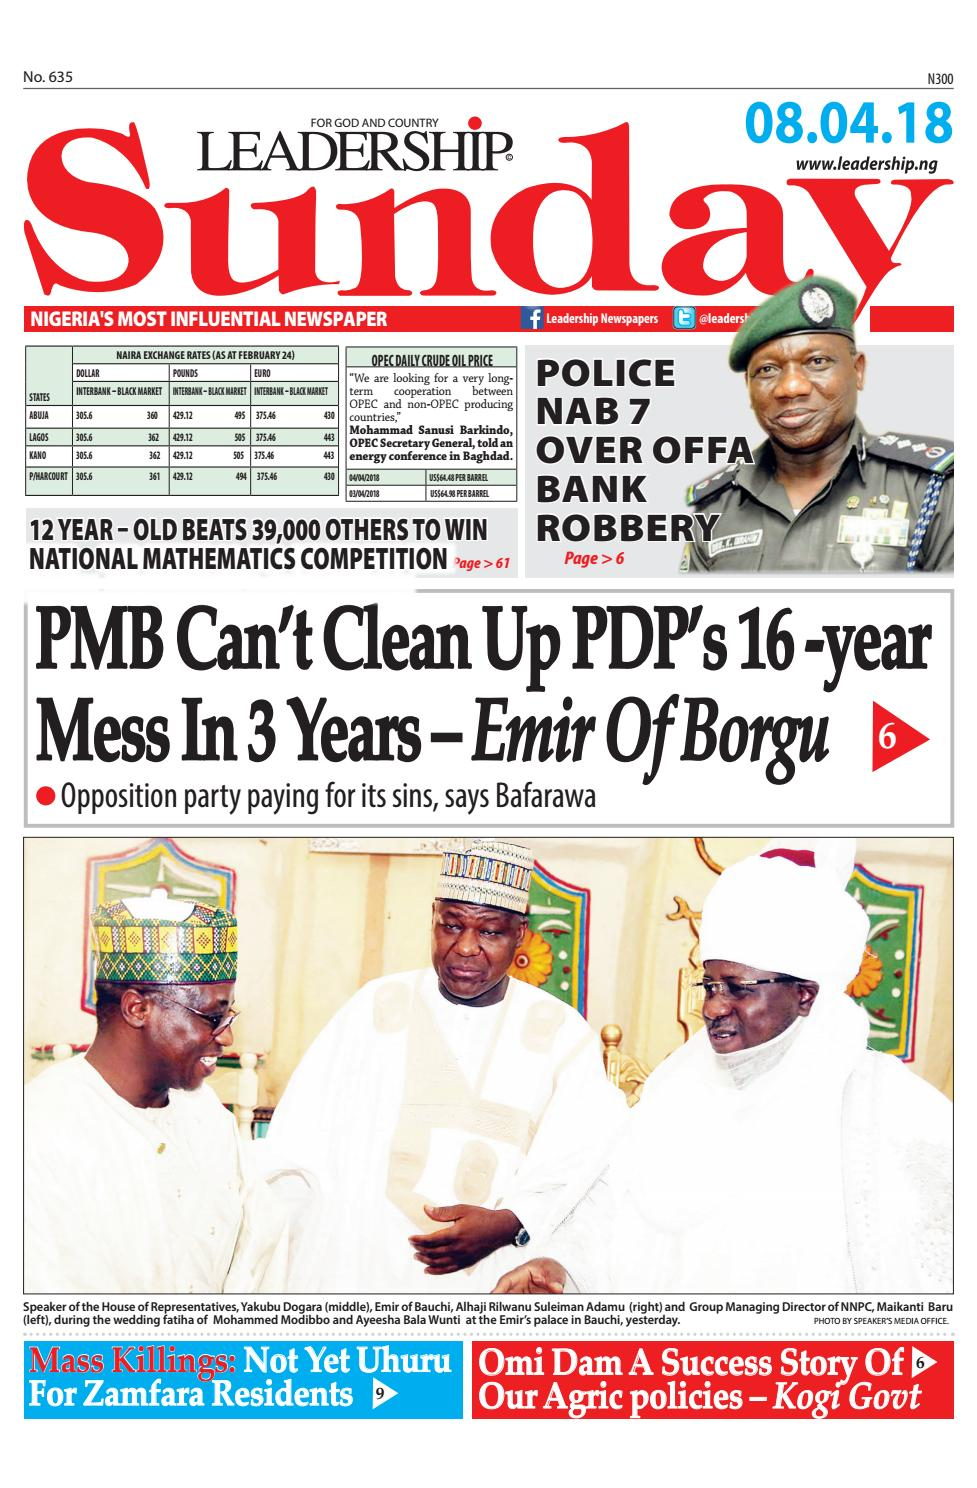 7195d96a367 Leadership Newspaper April 08 2018 by Leadership Newspapers Nigeria - issuu